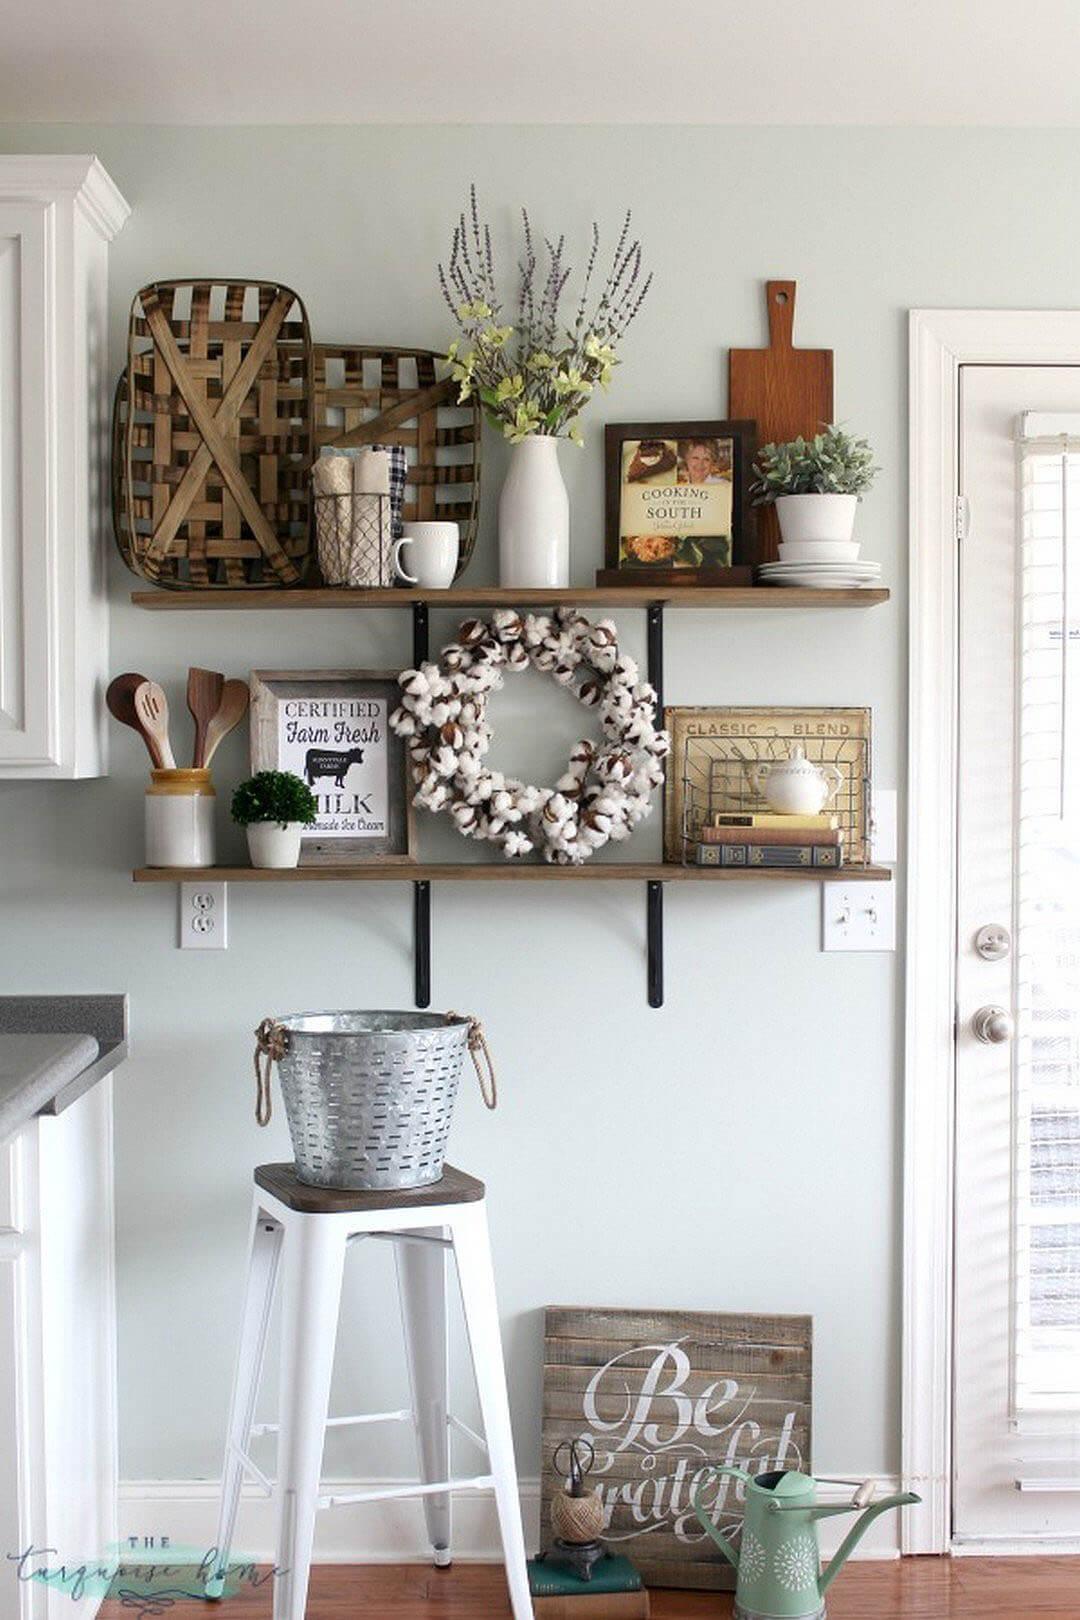 desain dinding dapur unik modern klasik